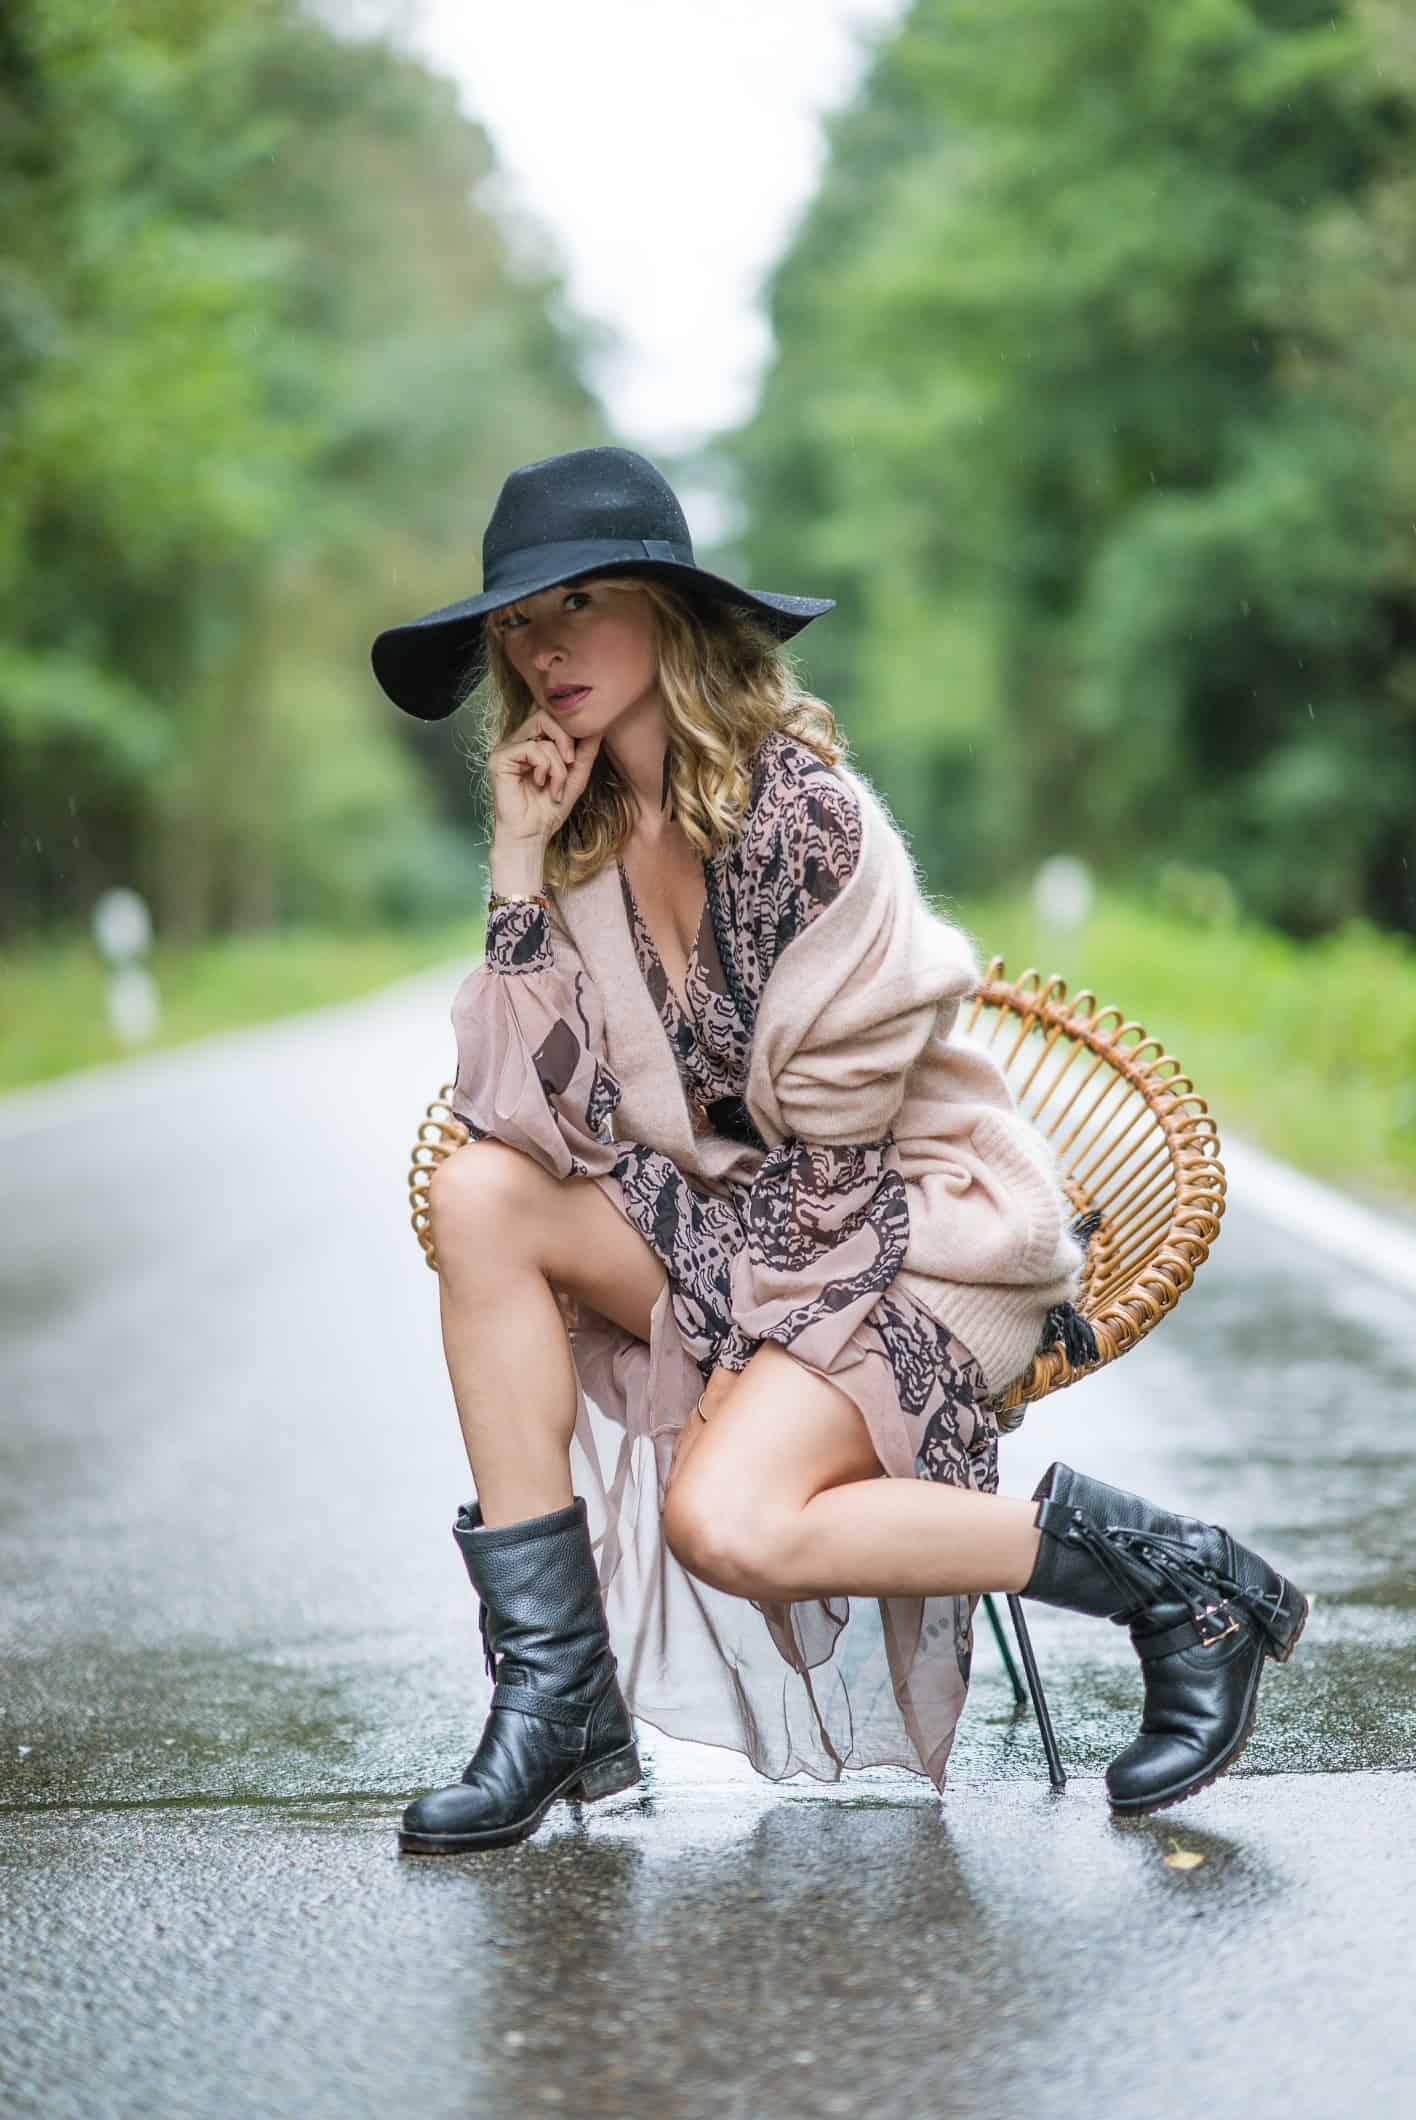 Nicki nowicki Boho Style Ü40 Blogger 40+